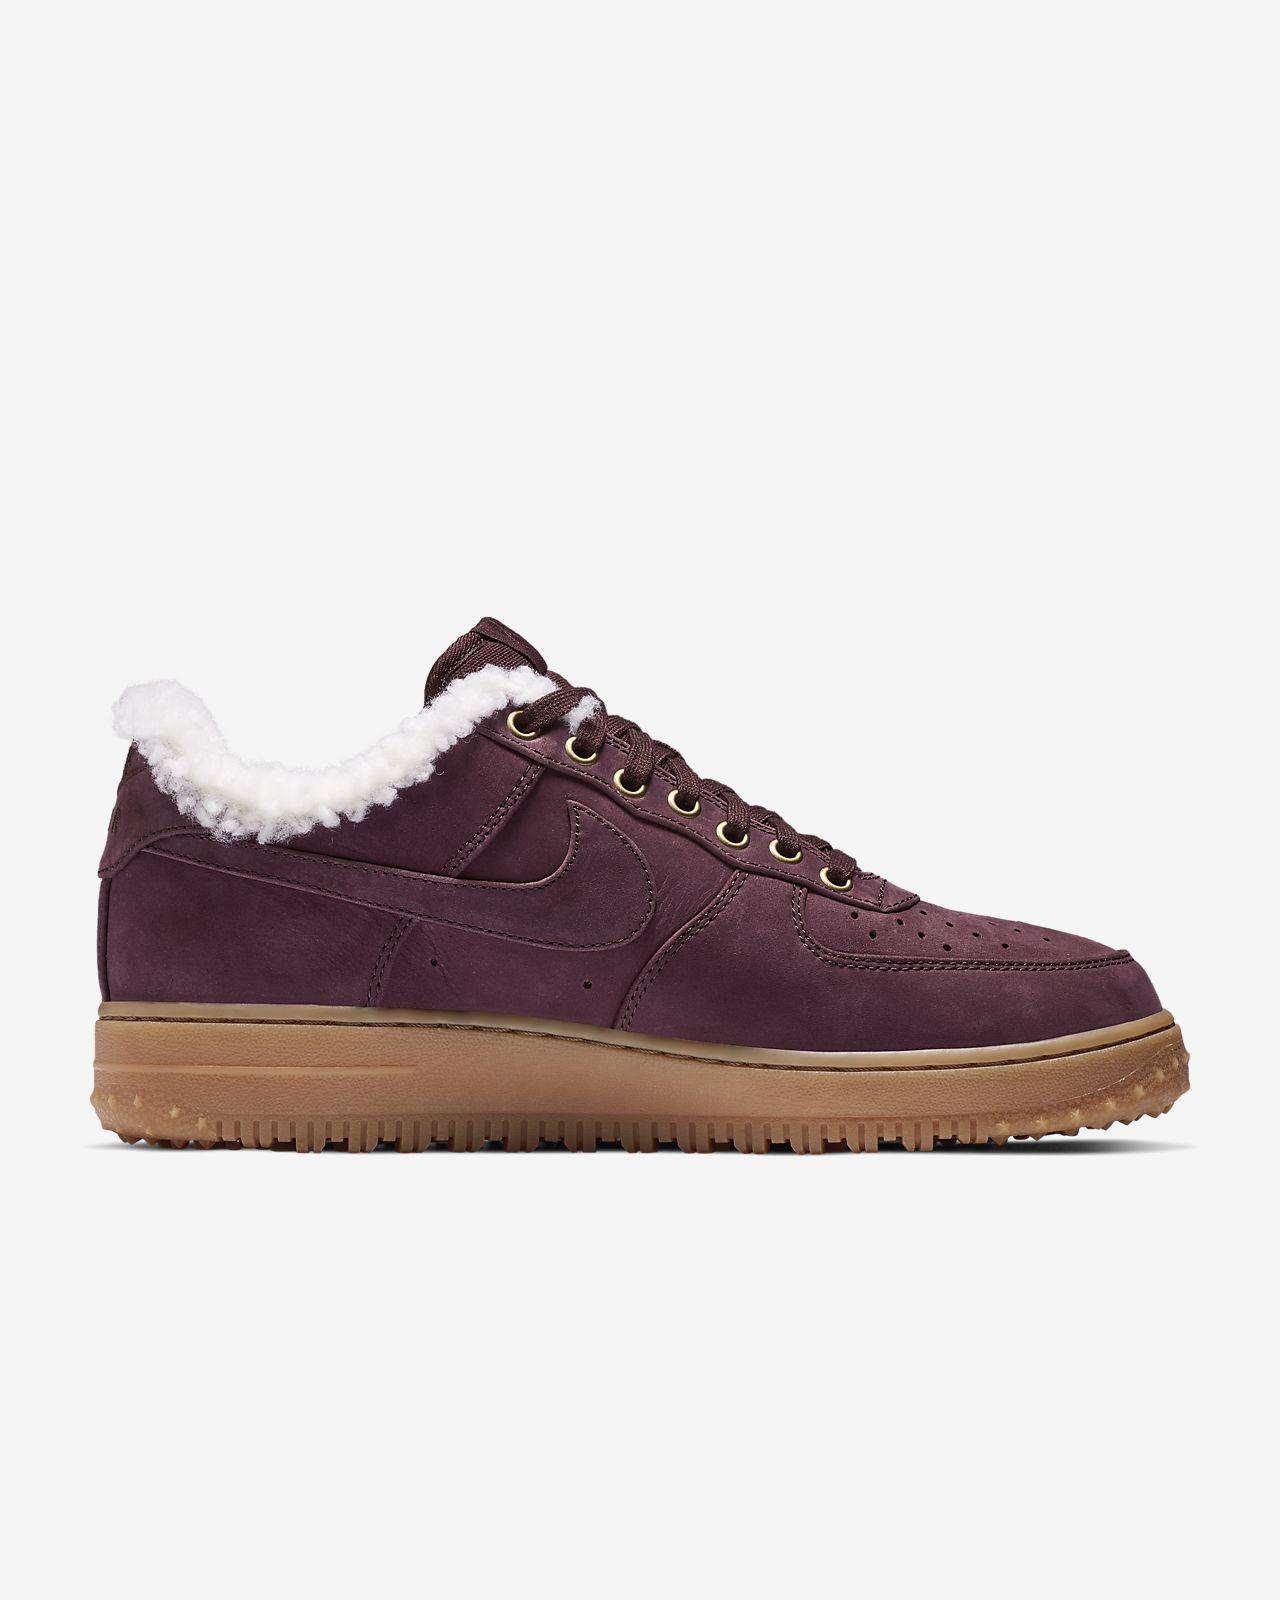 Pour Chaussure Homme Premium Qtshcrd Winter Air 1 Nike Force xhtsdQrC